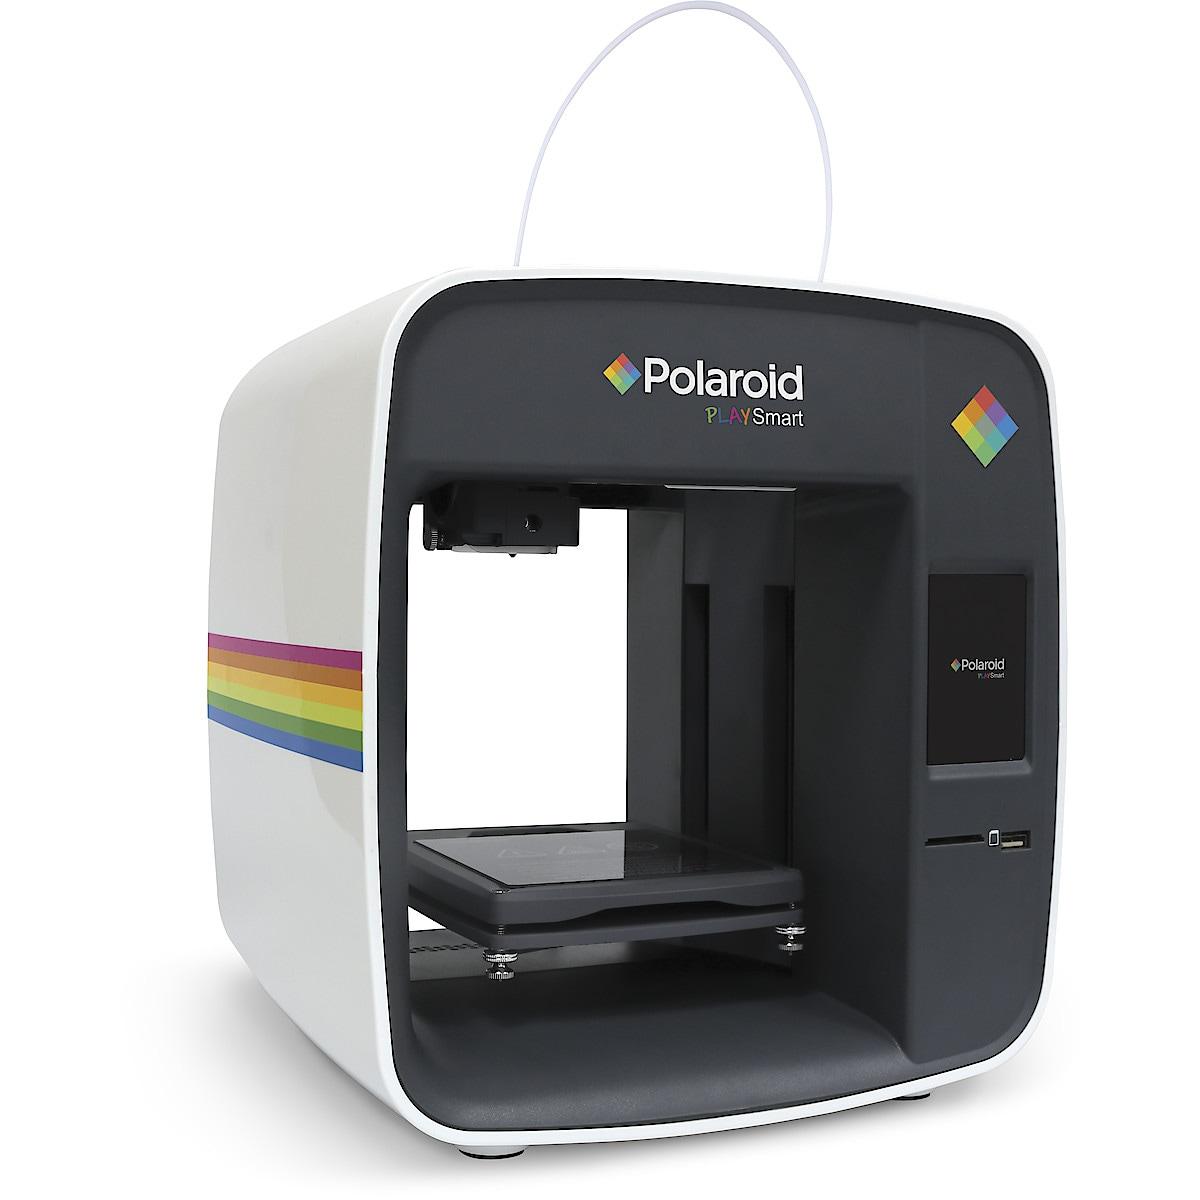 3D-Drucker Polaroid PlaySmart